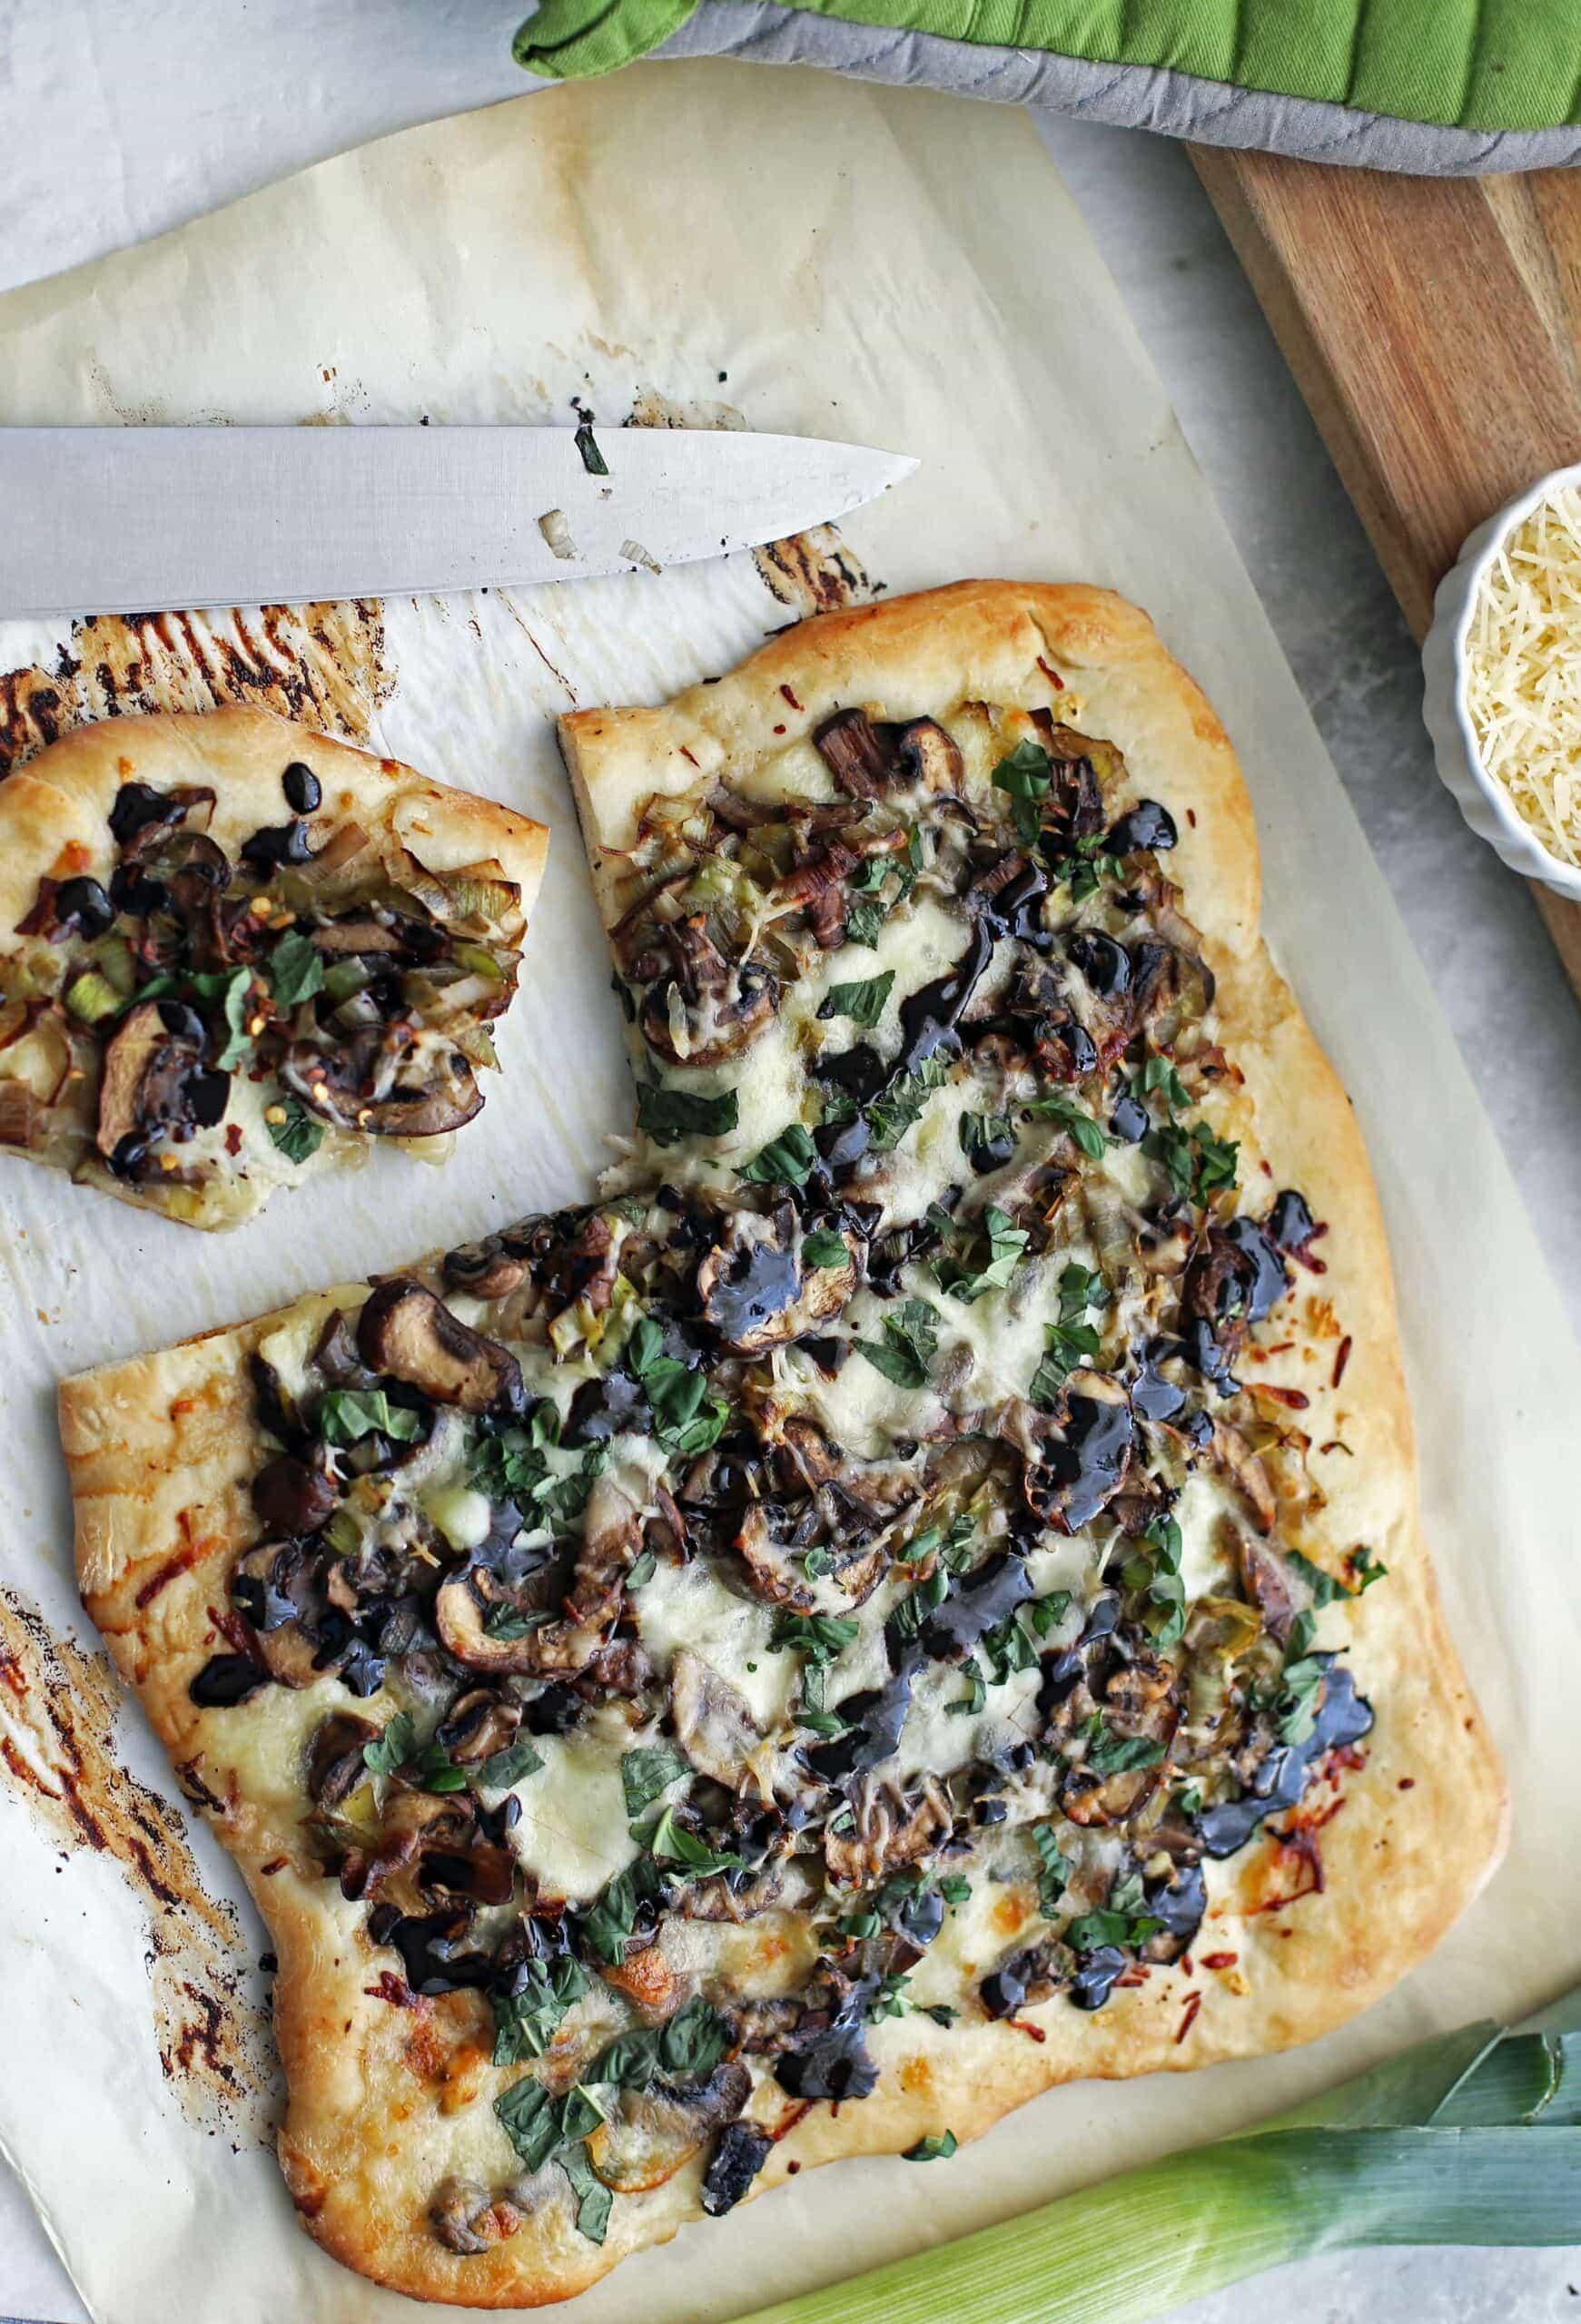 One-Hour Leek Mushroom Mozzarella Pizza (from scratch!)